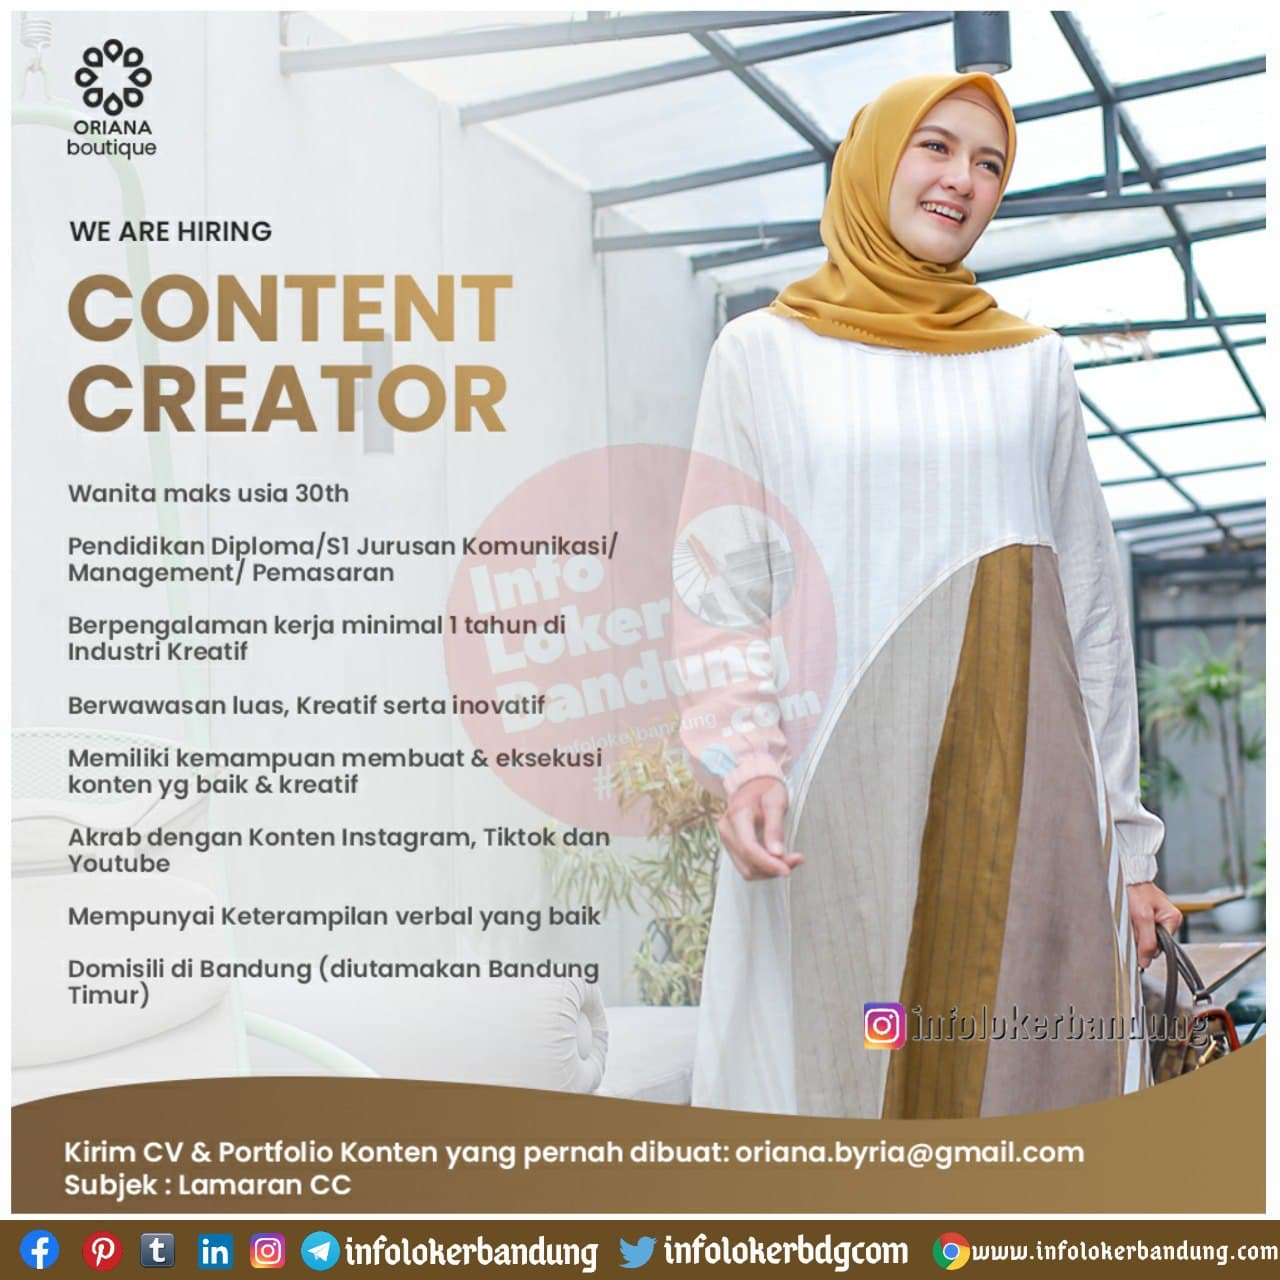 Lowongan Kerja Content Creator Oriana Boutique Bandung Desember 2020